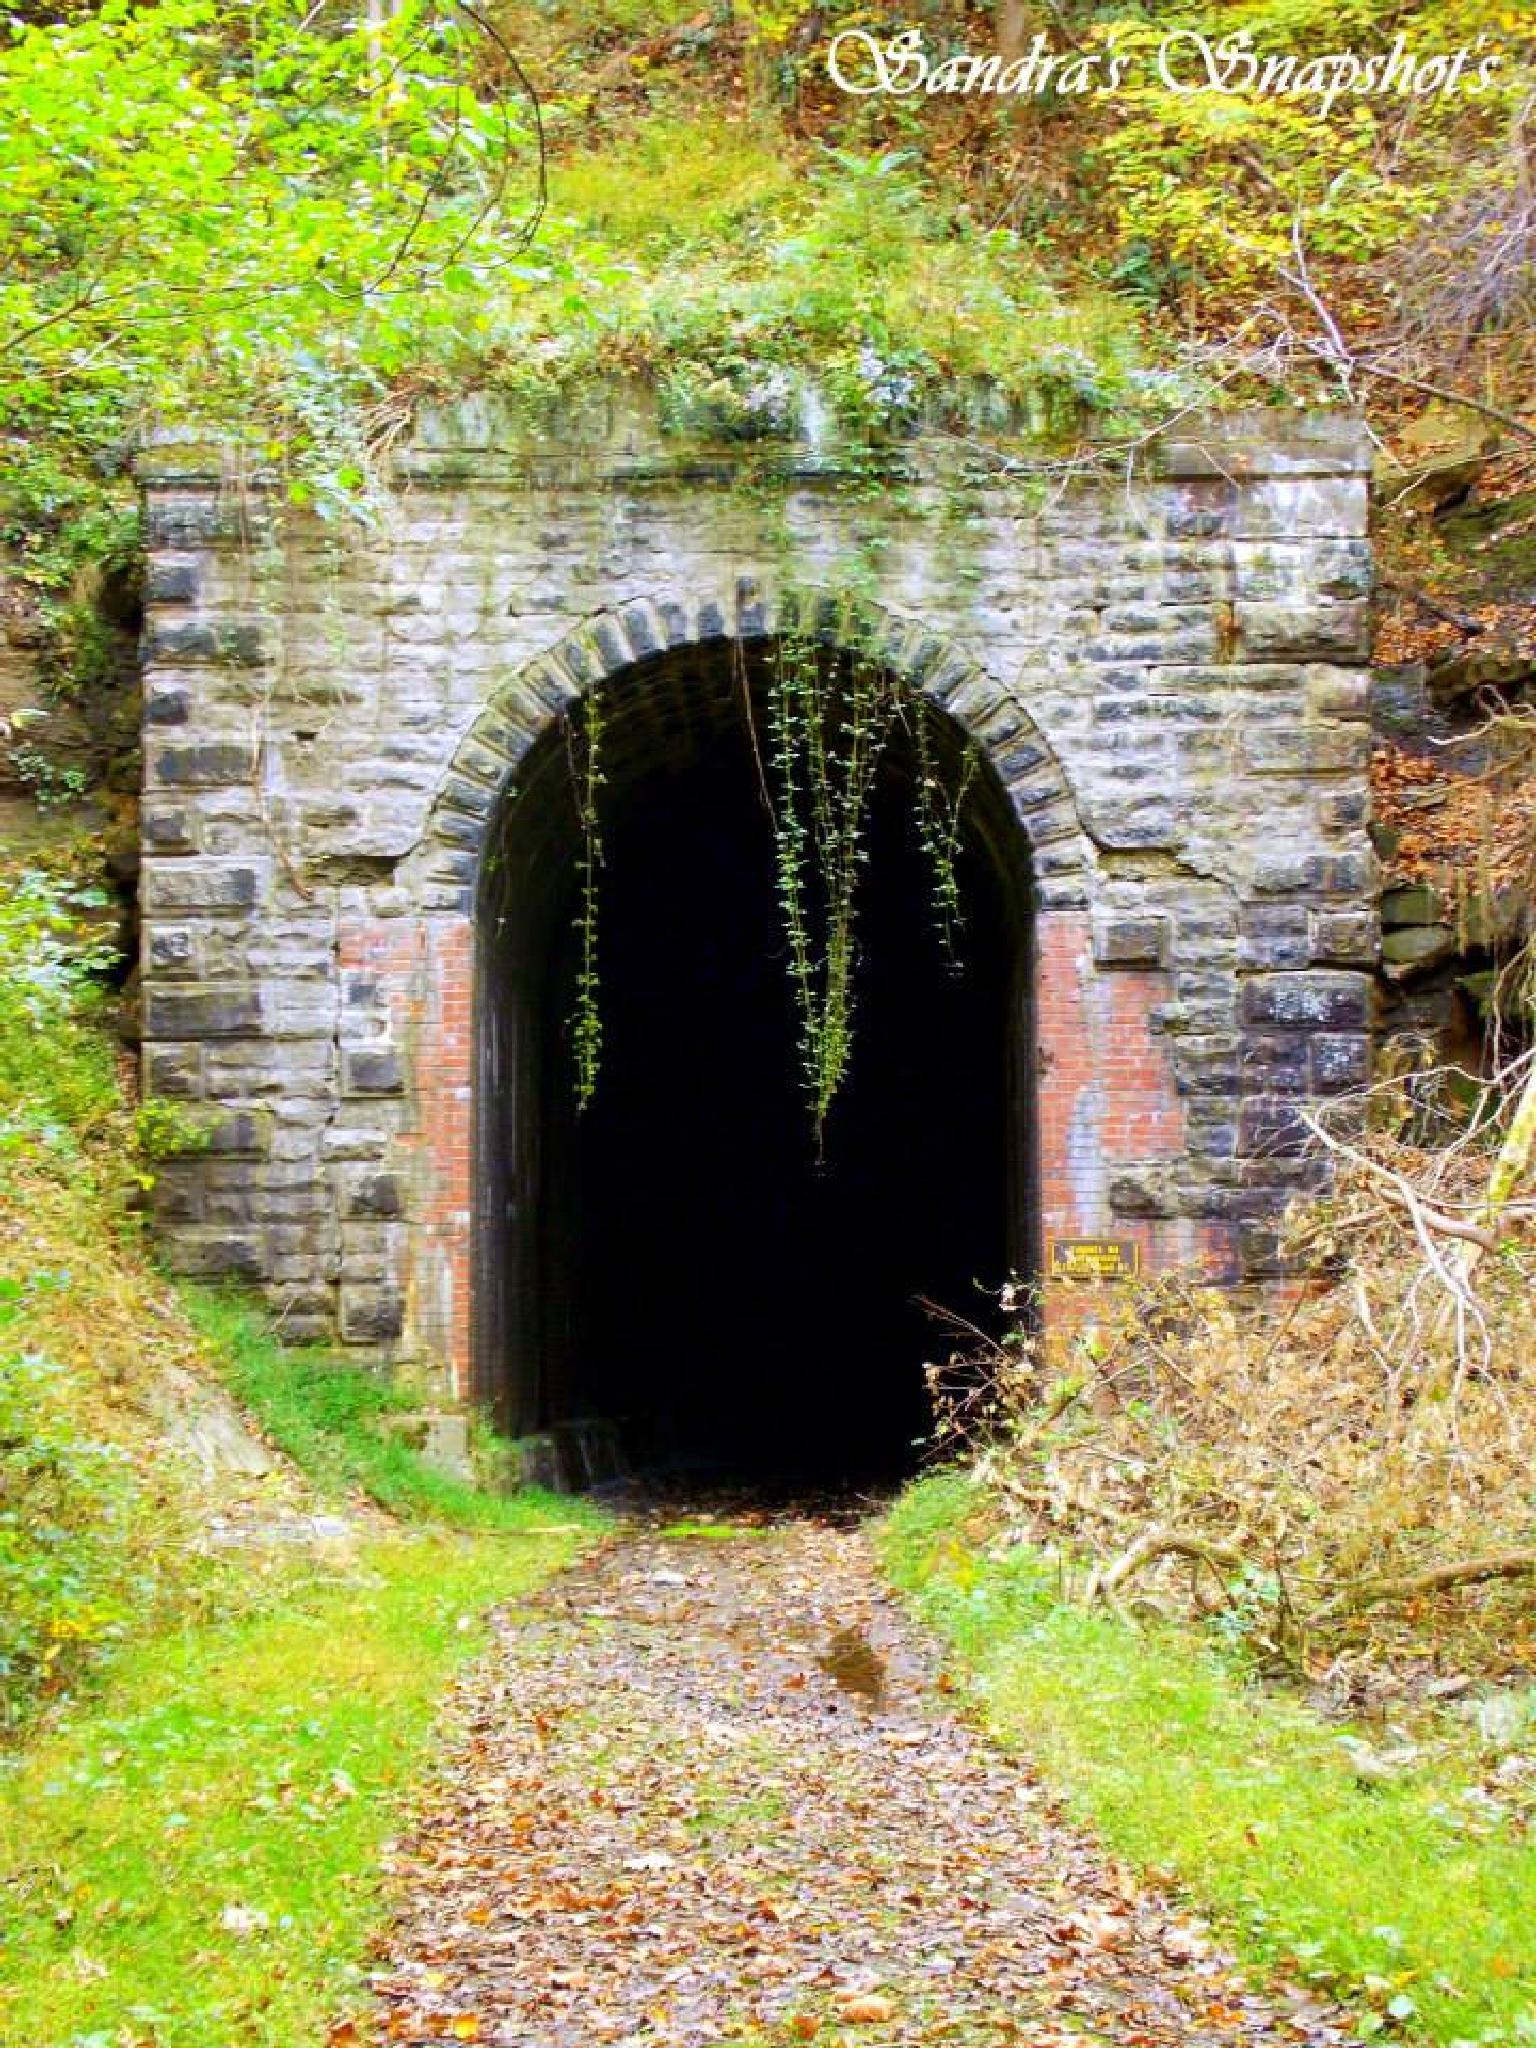 Train Tunnel by sandras.snapshots